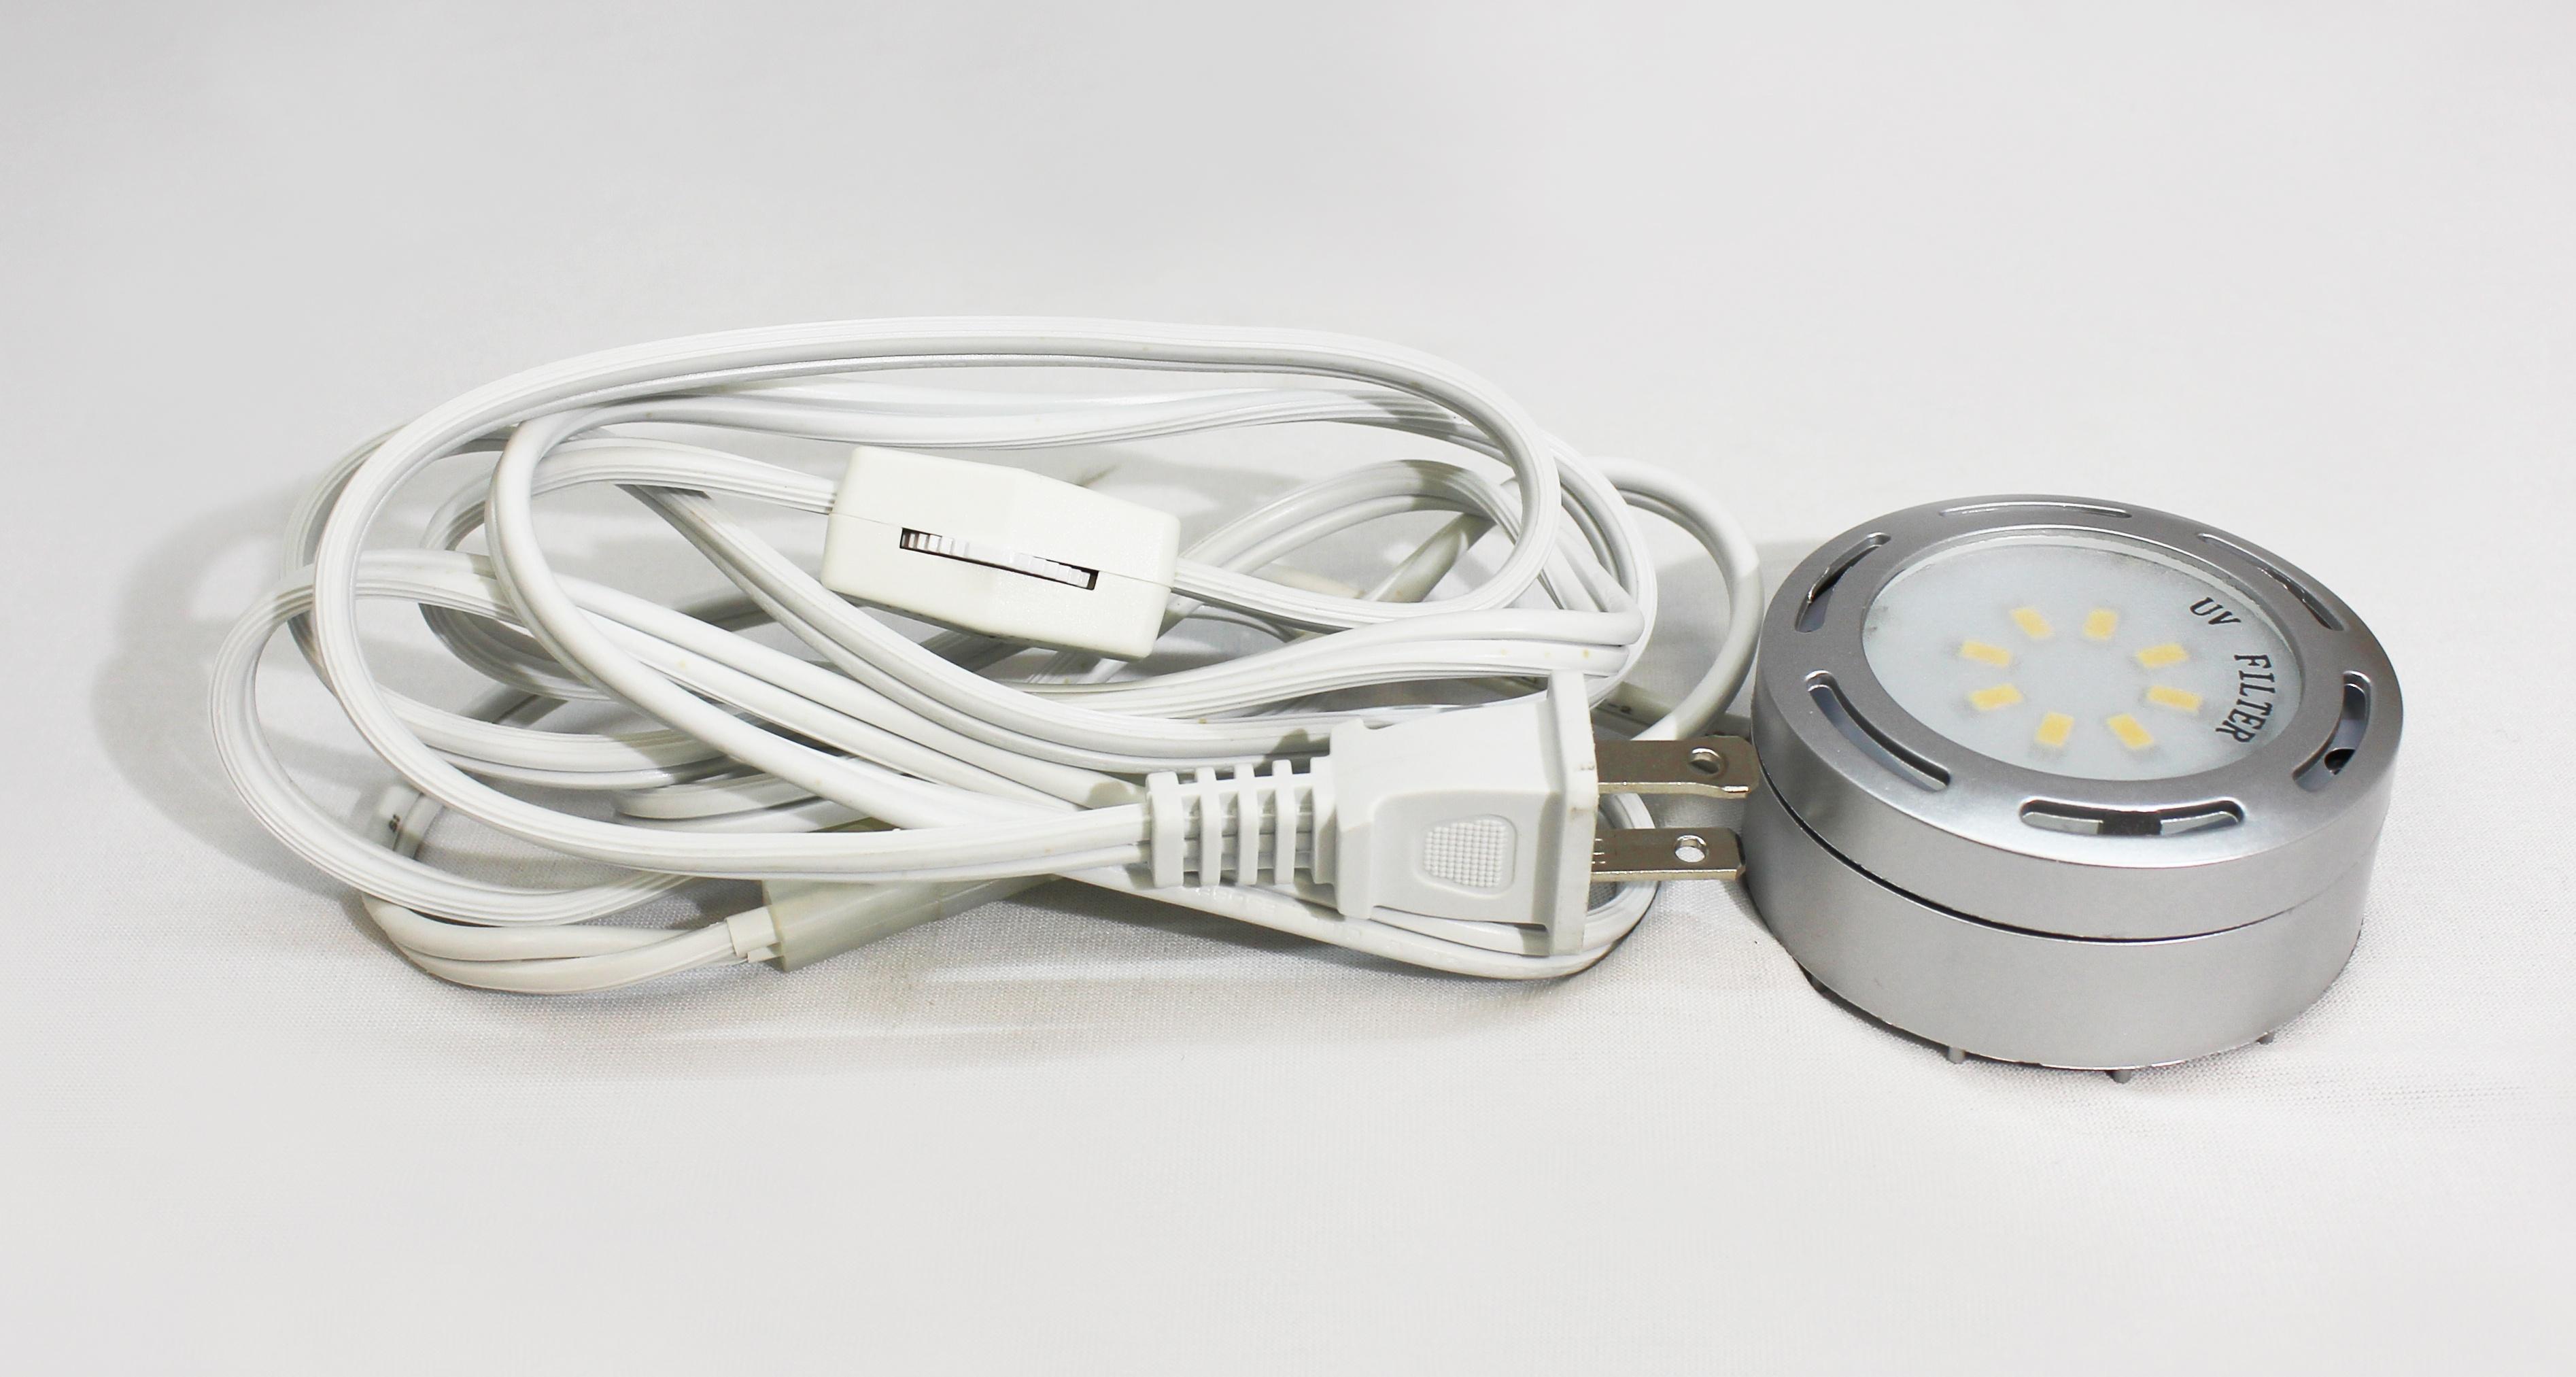 120 Volt Led Puck Lights 3 Pk Eco Energy Management